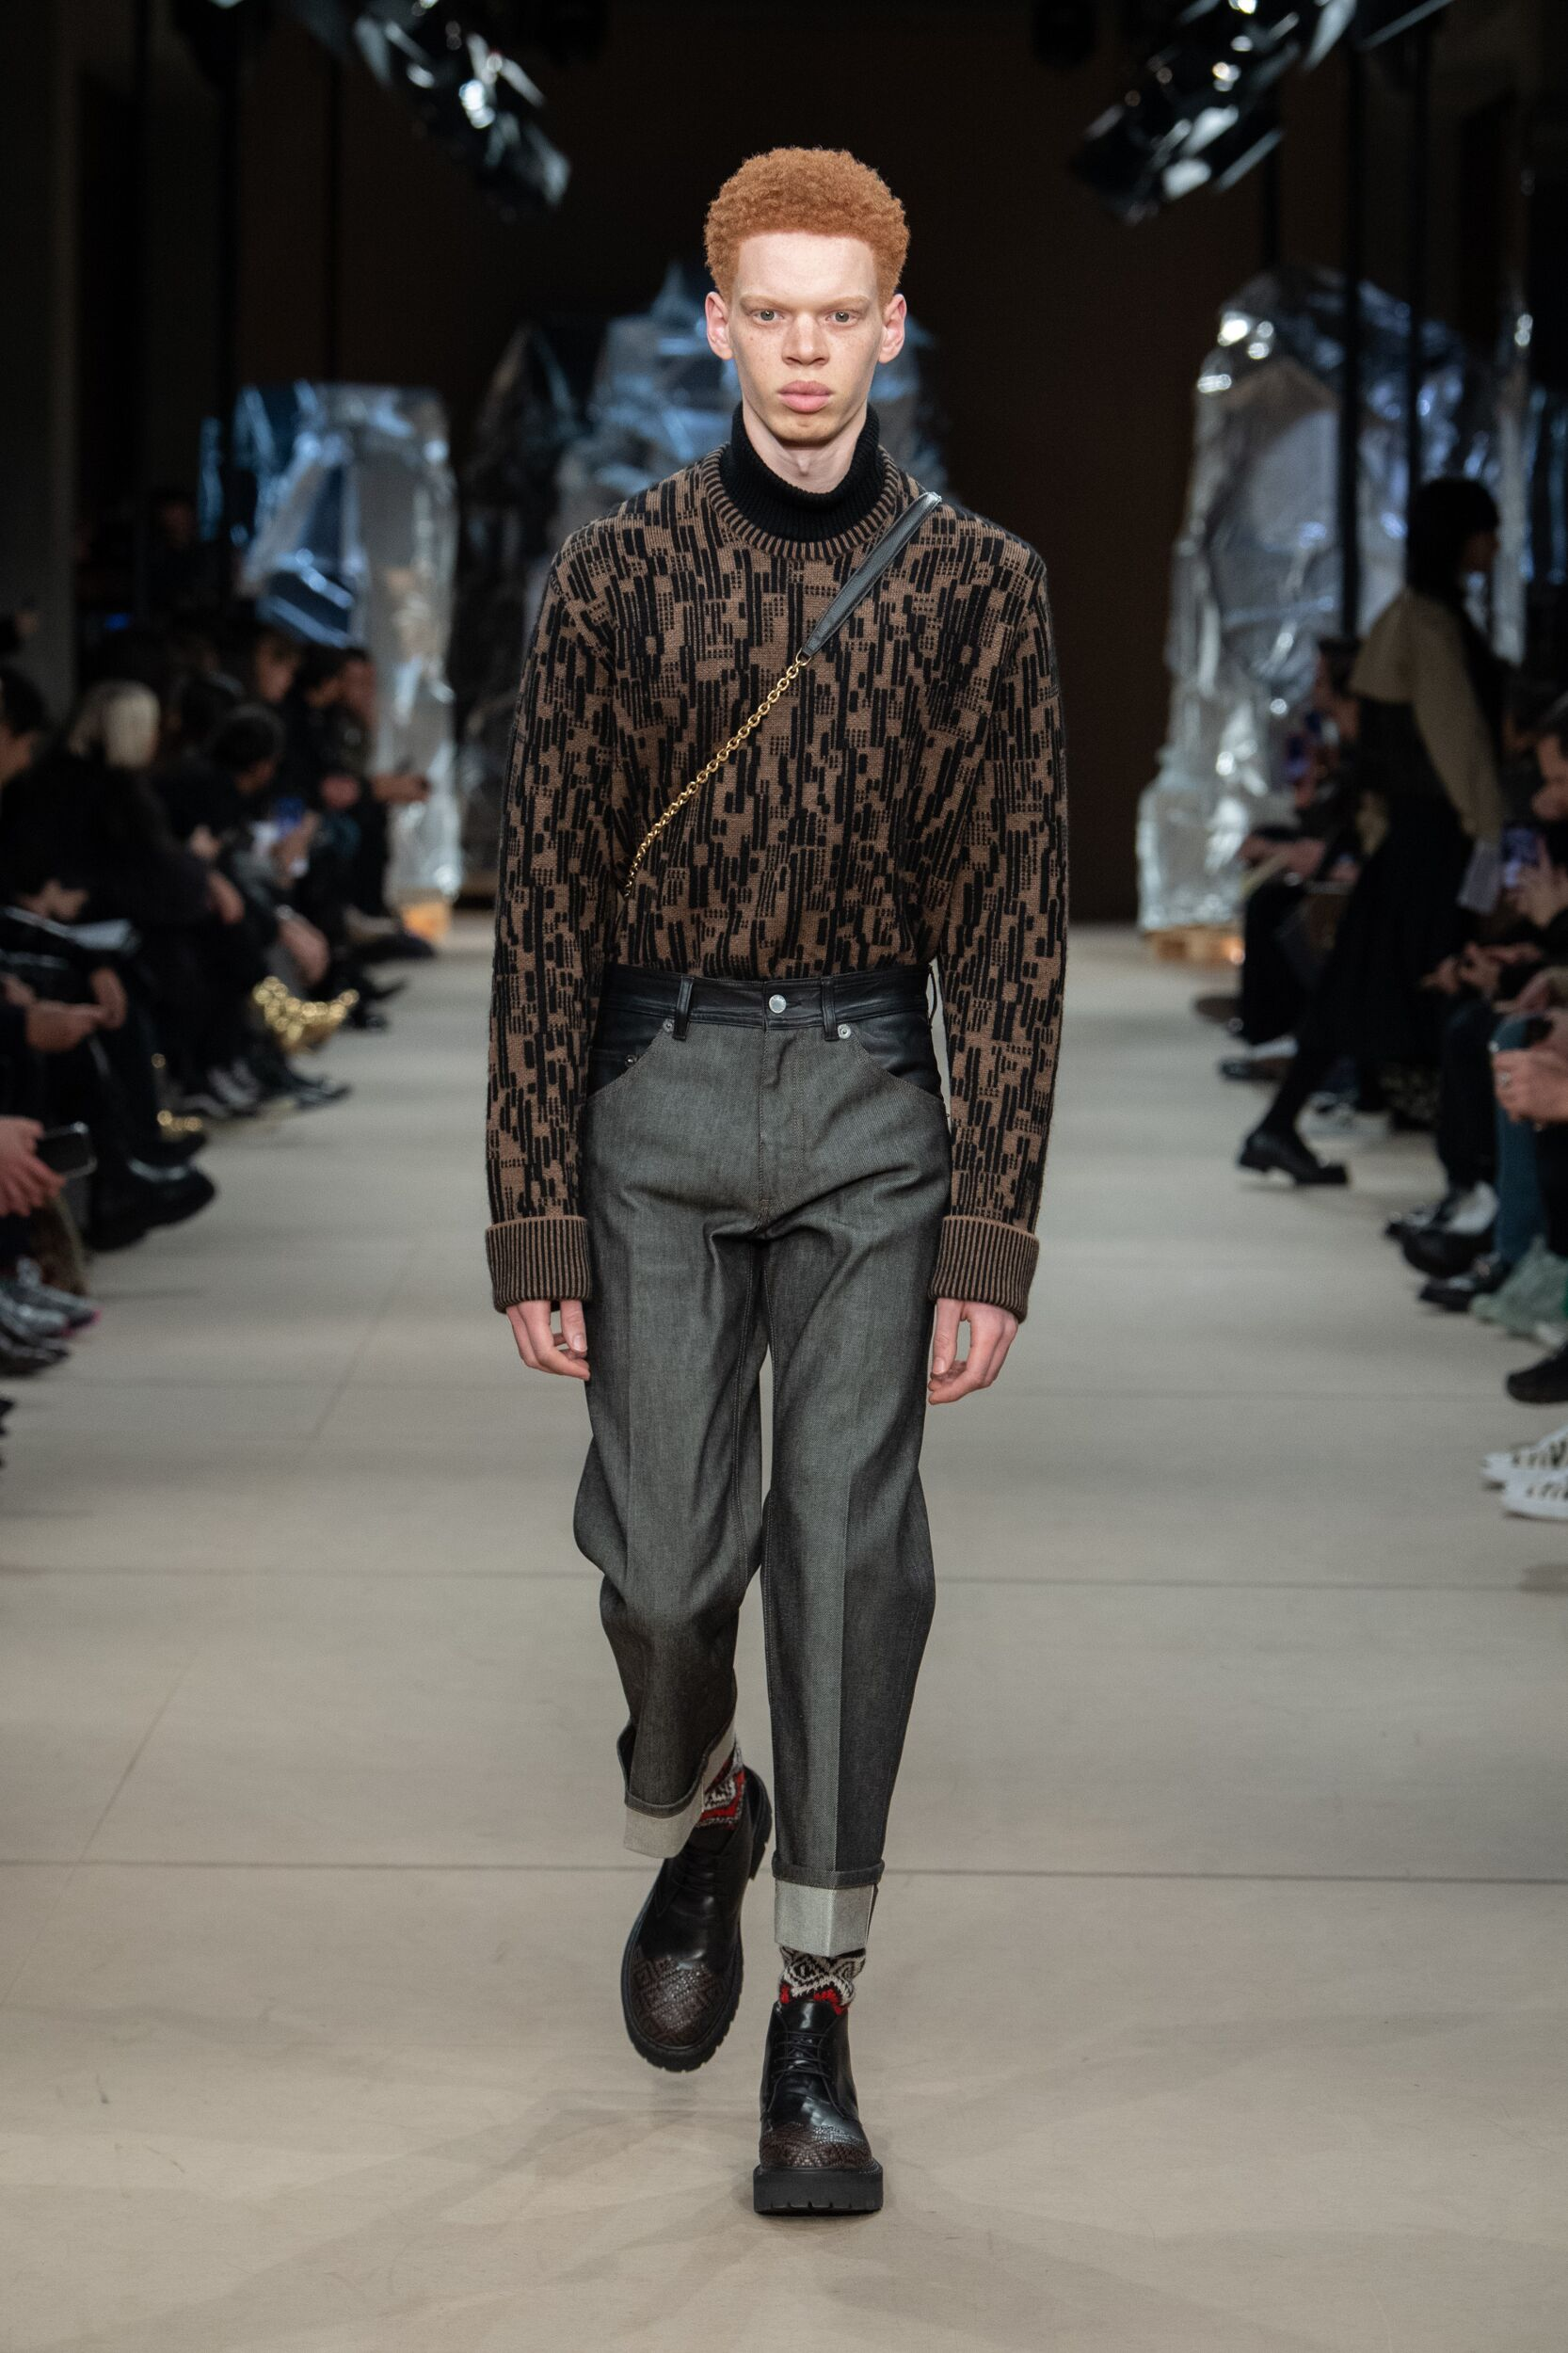 Catwalk Neil Barrett Men Fashion Show Winter 2020